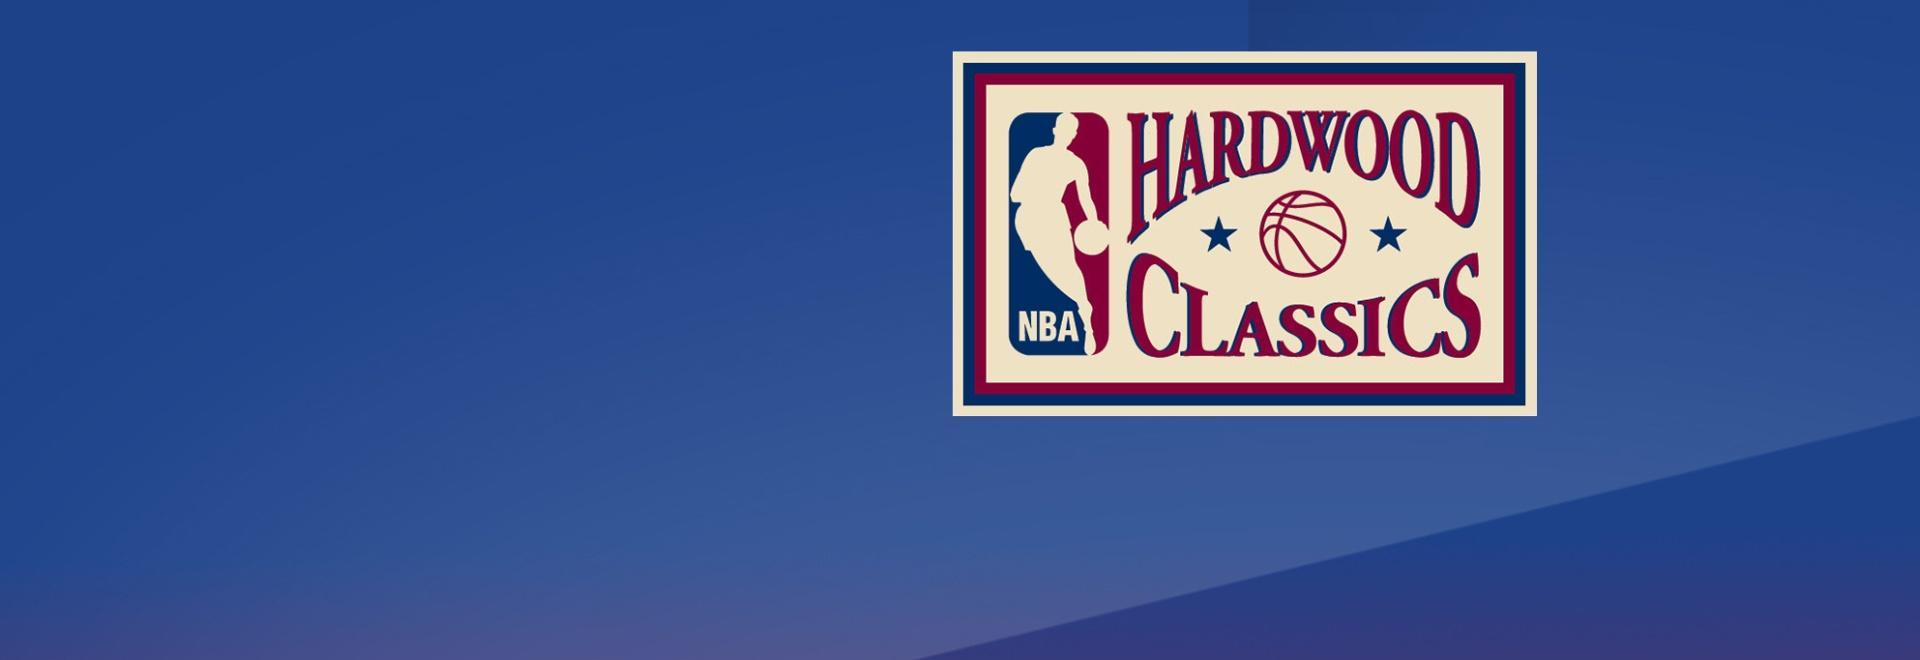 Celtics - Lakers 1984. Finals Game 6